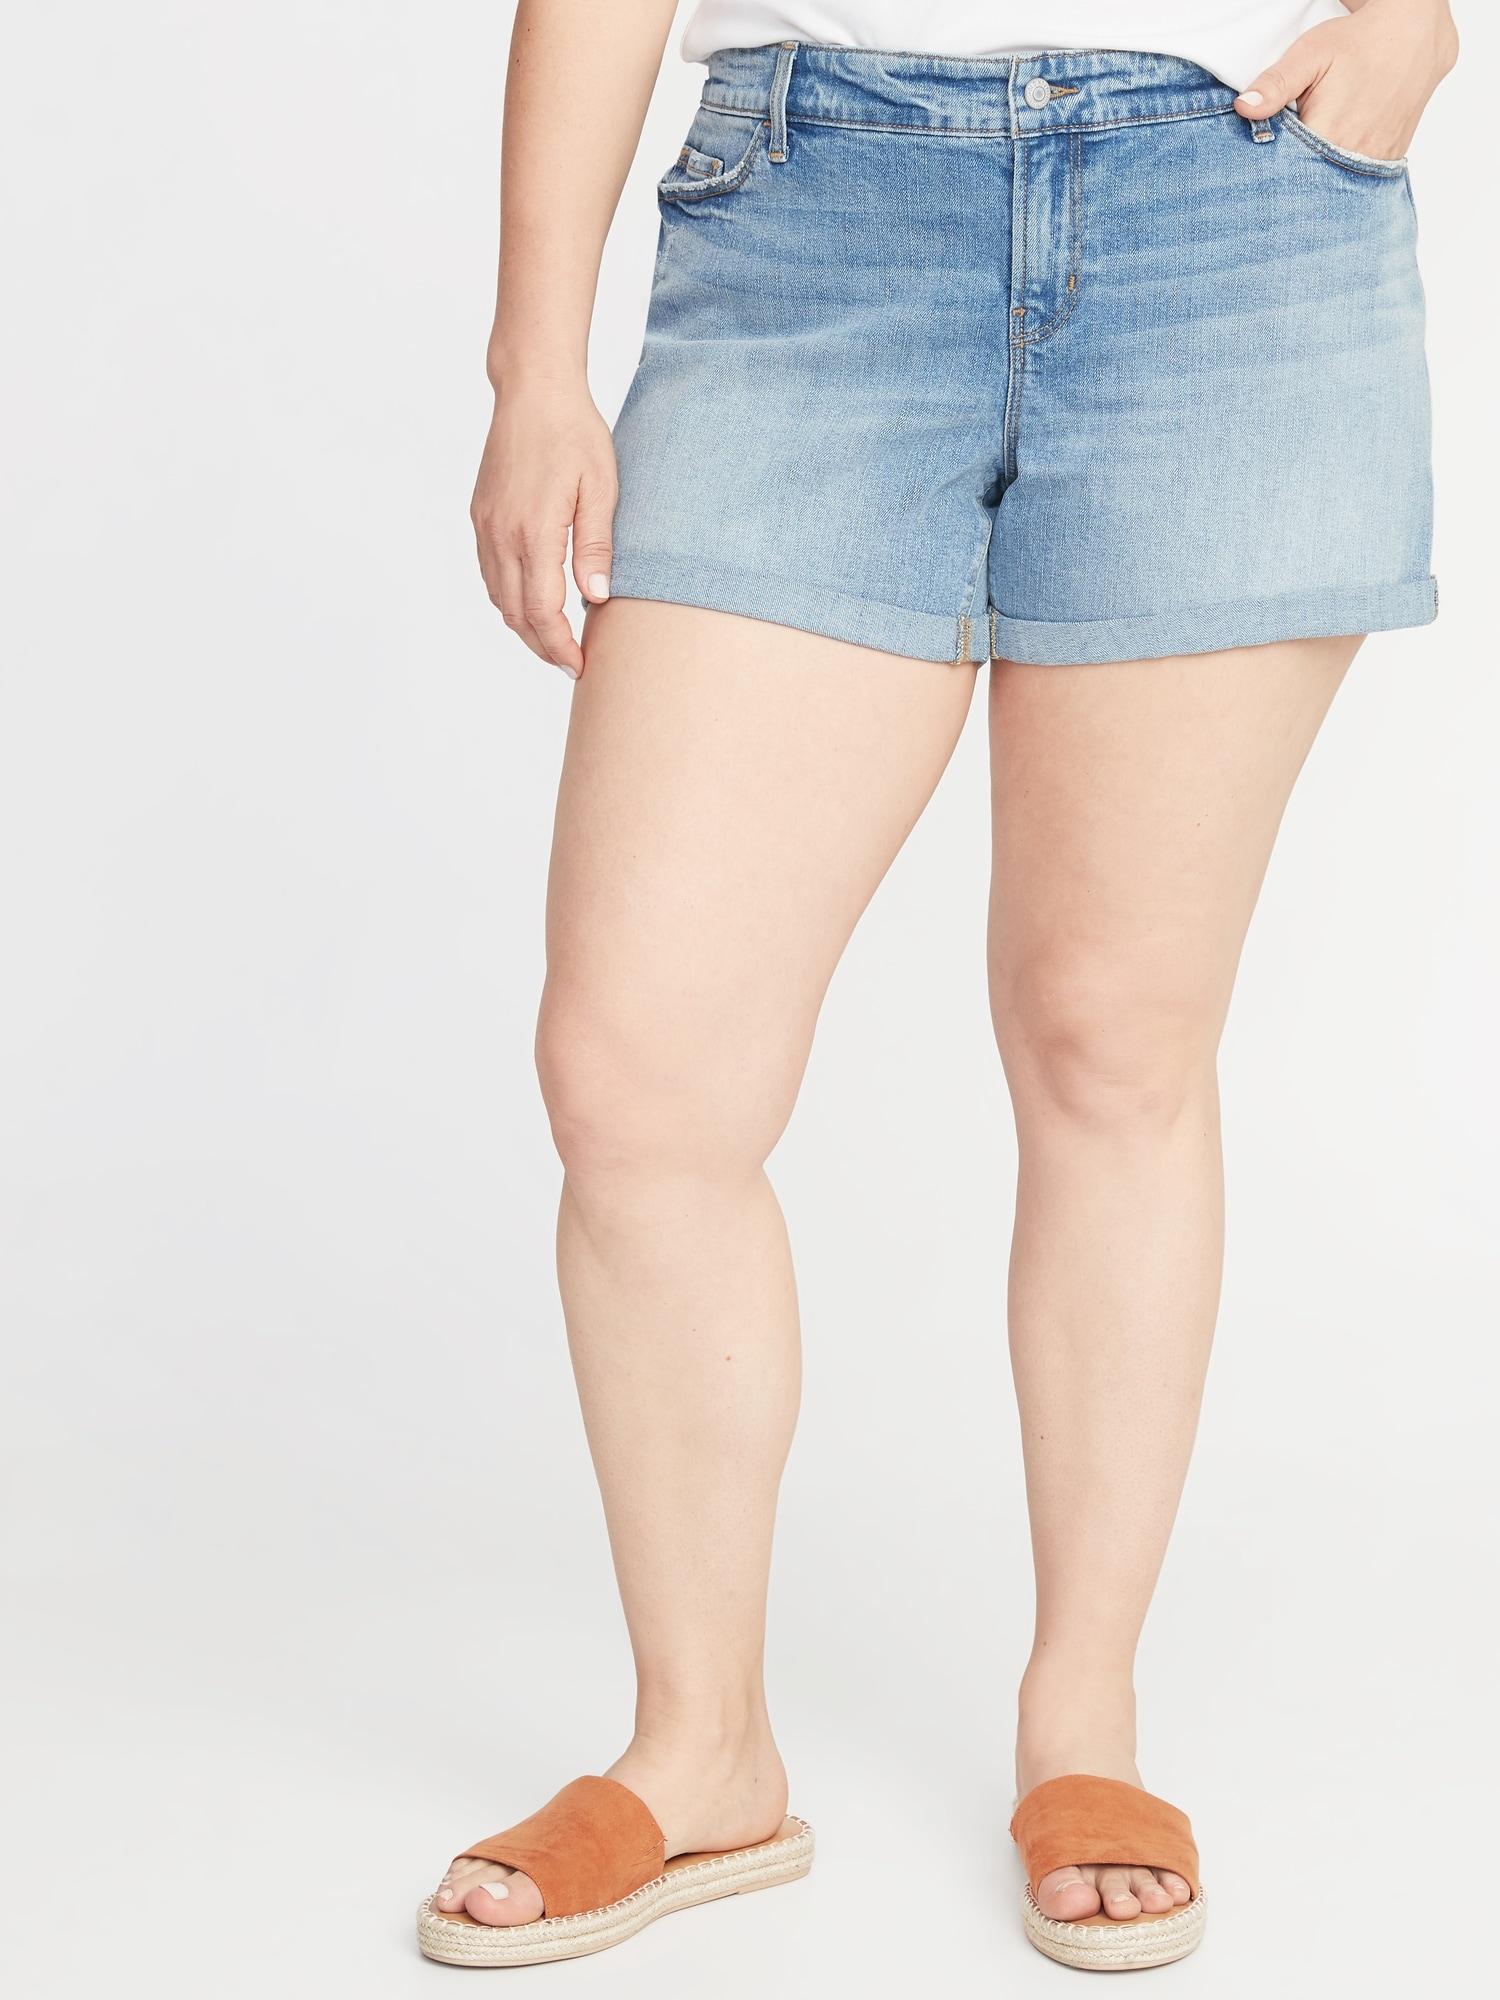 ad6b3fb53c Mid-Rise Boyfriend Distressed Plus-Size Denim Shorts - 5-inch inseam ...